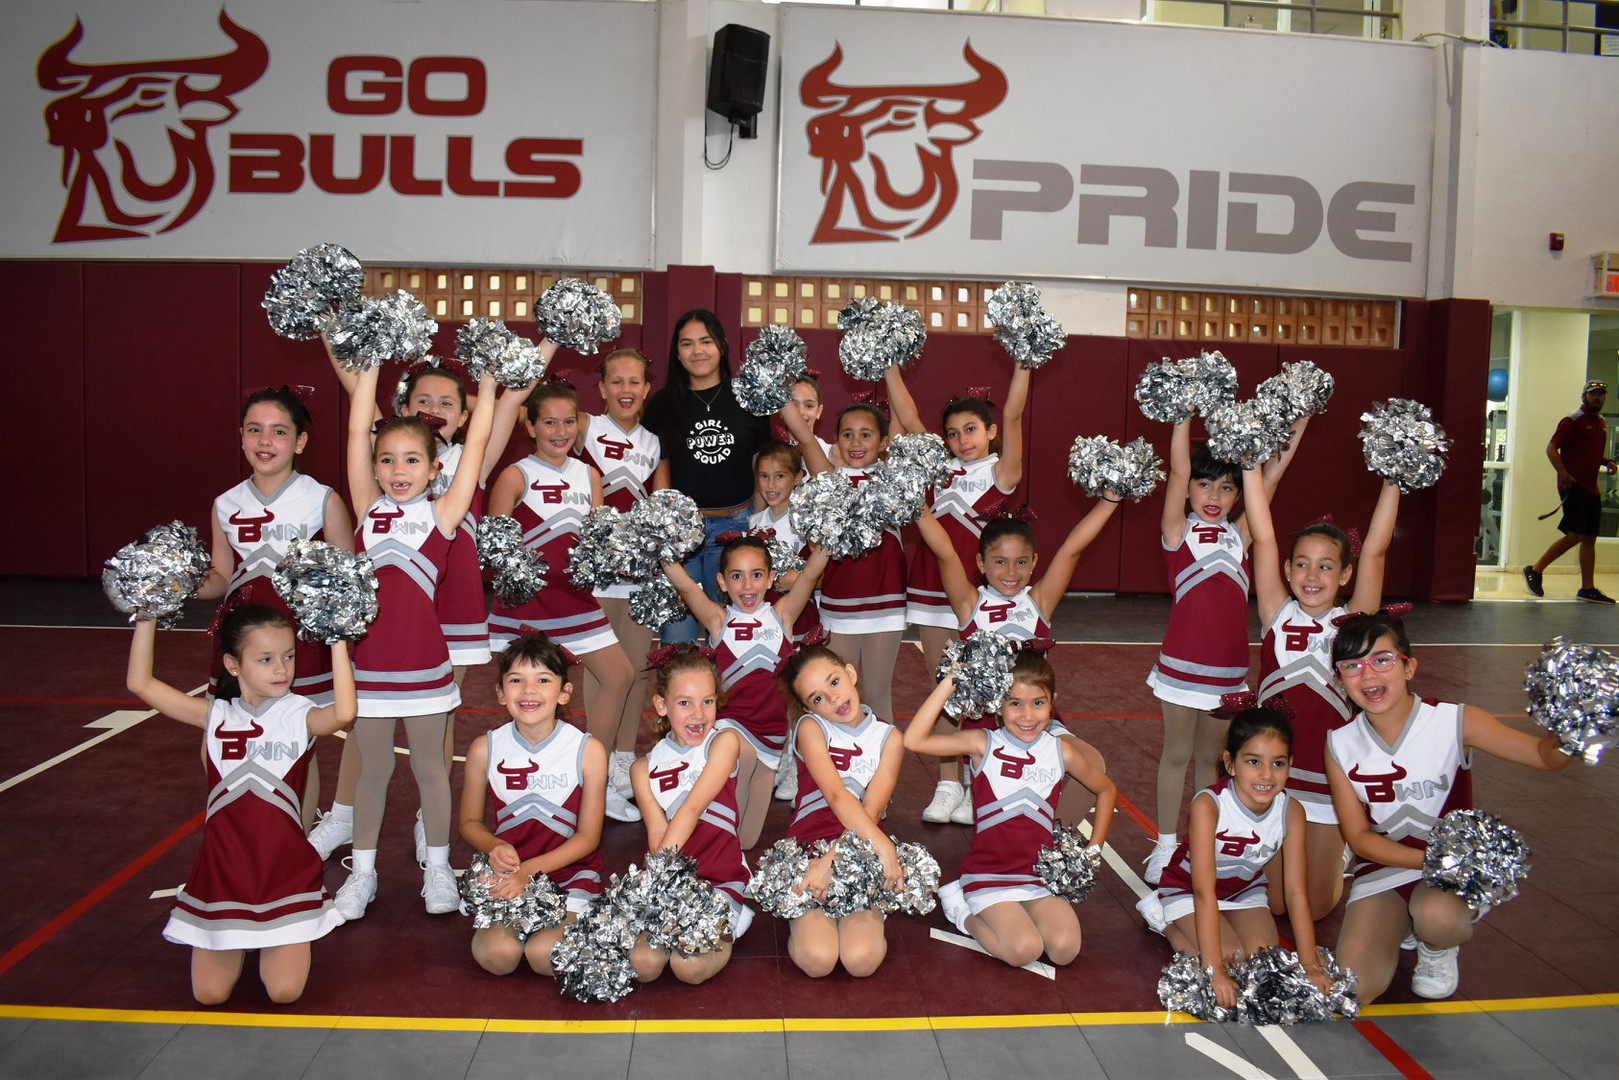 Bulls cheer squad